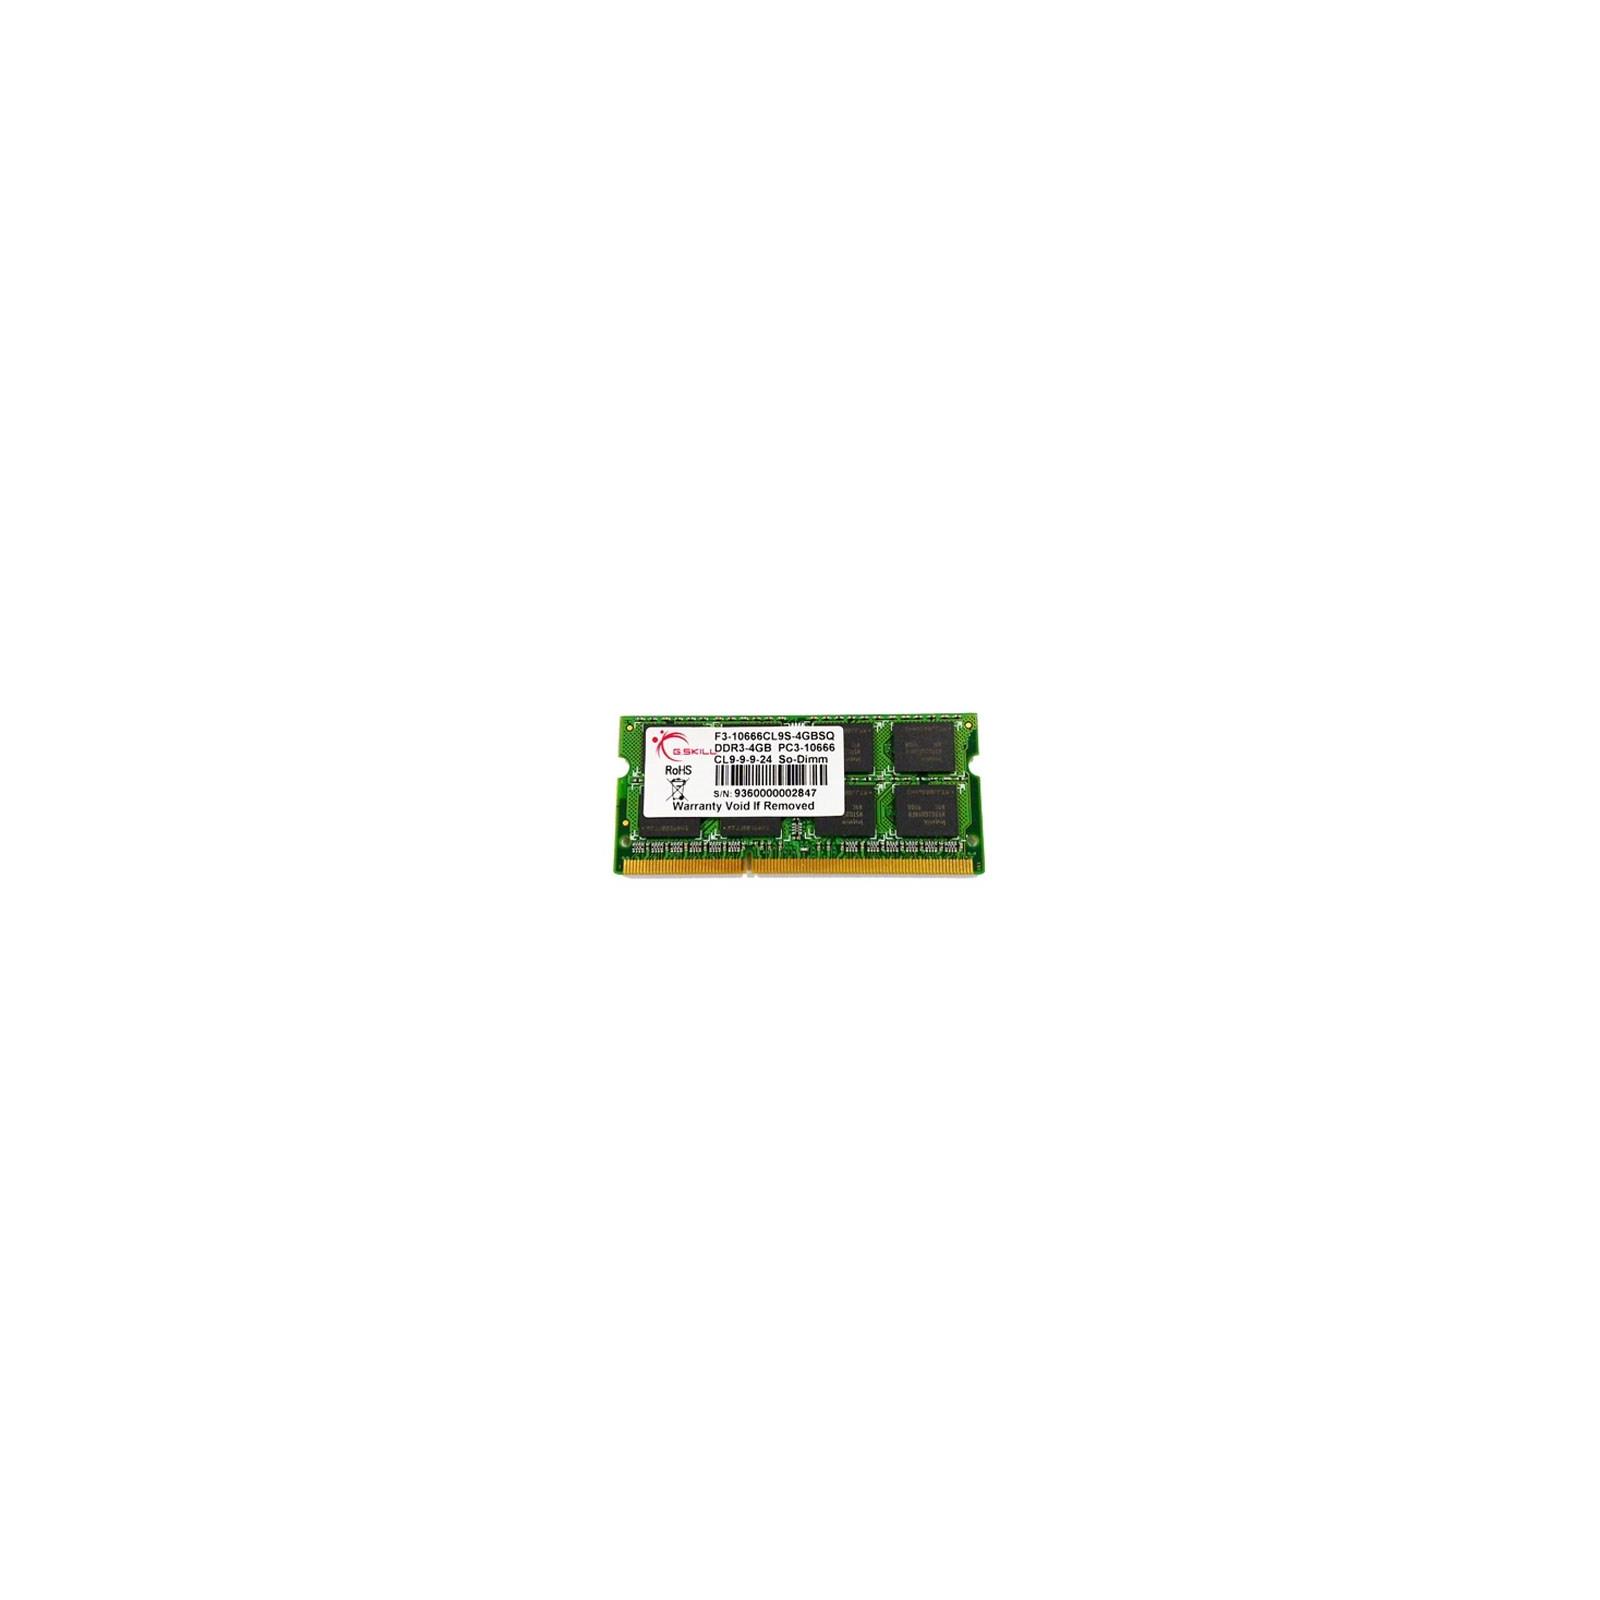 Модуль памяти для ноутбука SoDIMM DDR3 4GB (2x2GB)1333 MHz G.Skill (F3-10666CL9D-4GBSQ)